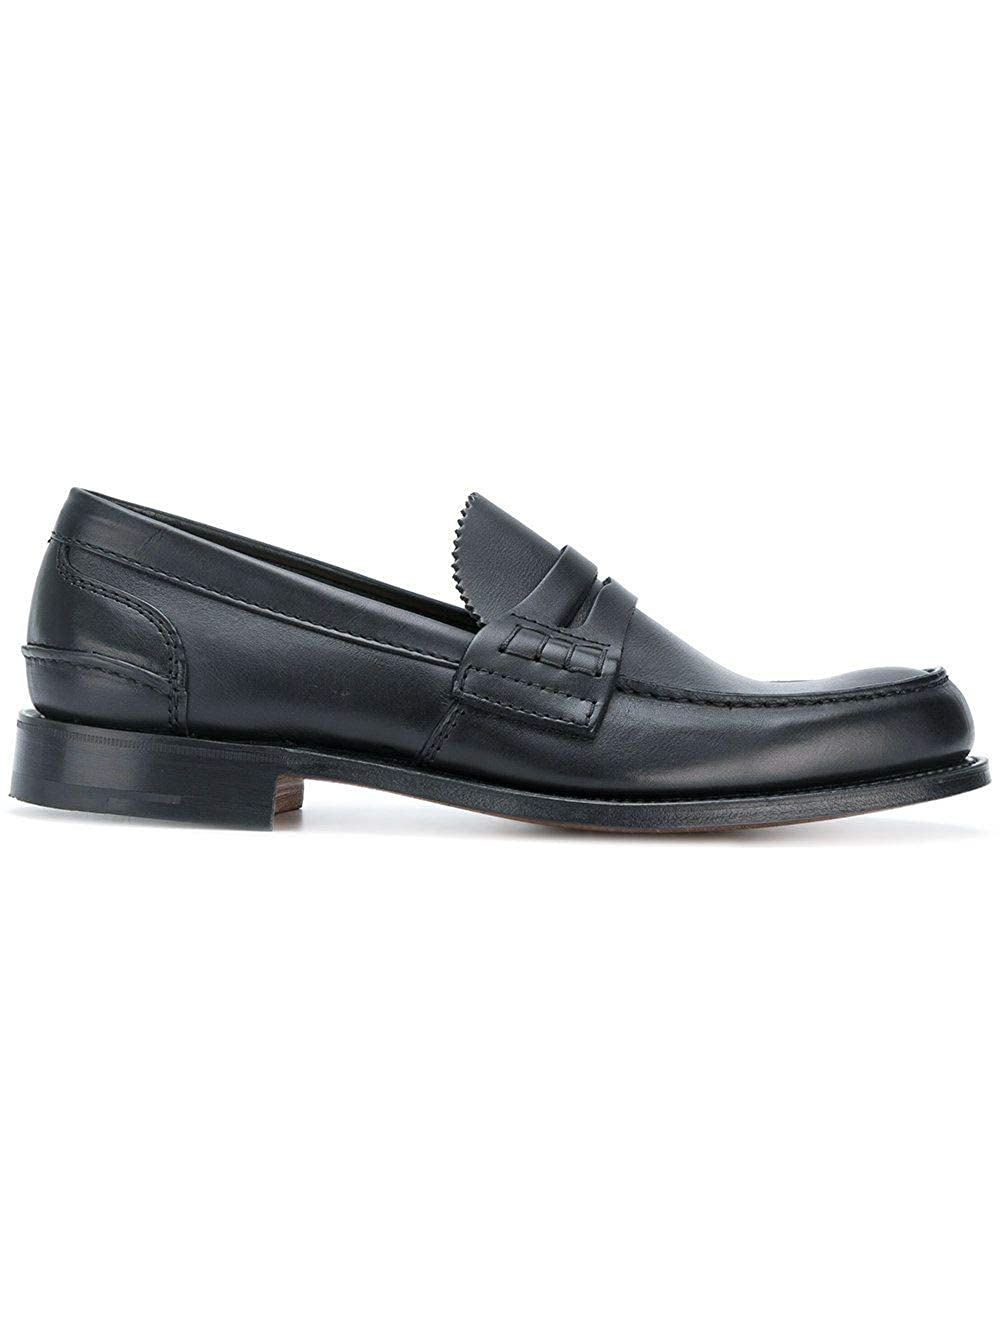 - Church's Hombre EDB0039FGF0AAB azul Cuero zapatos